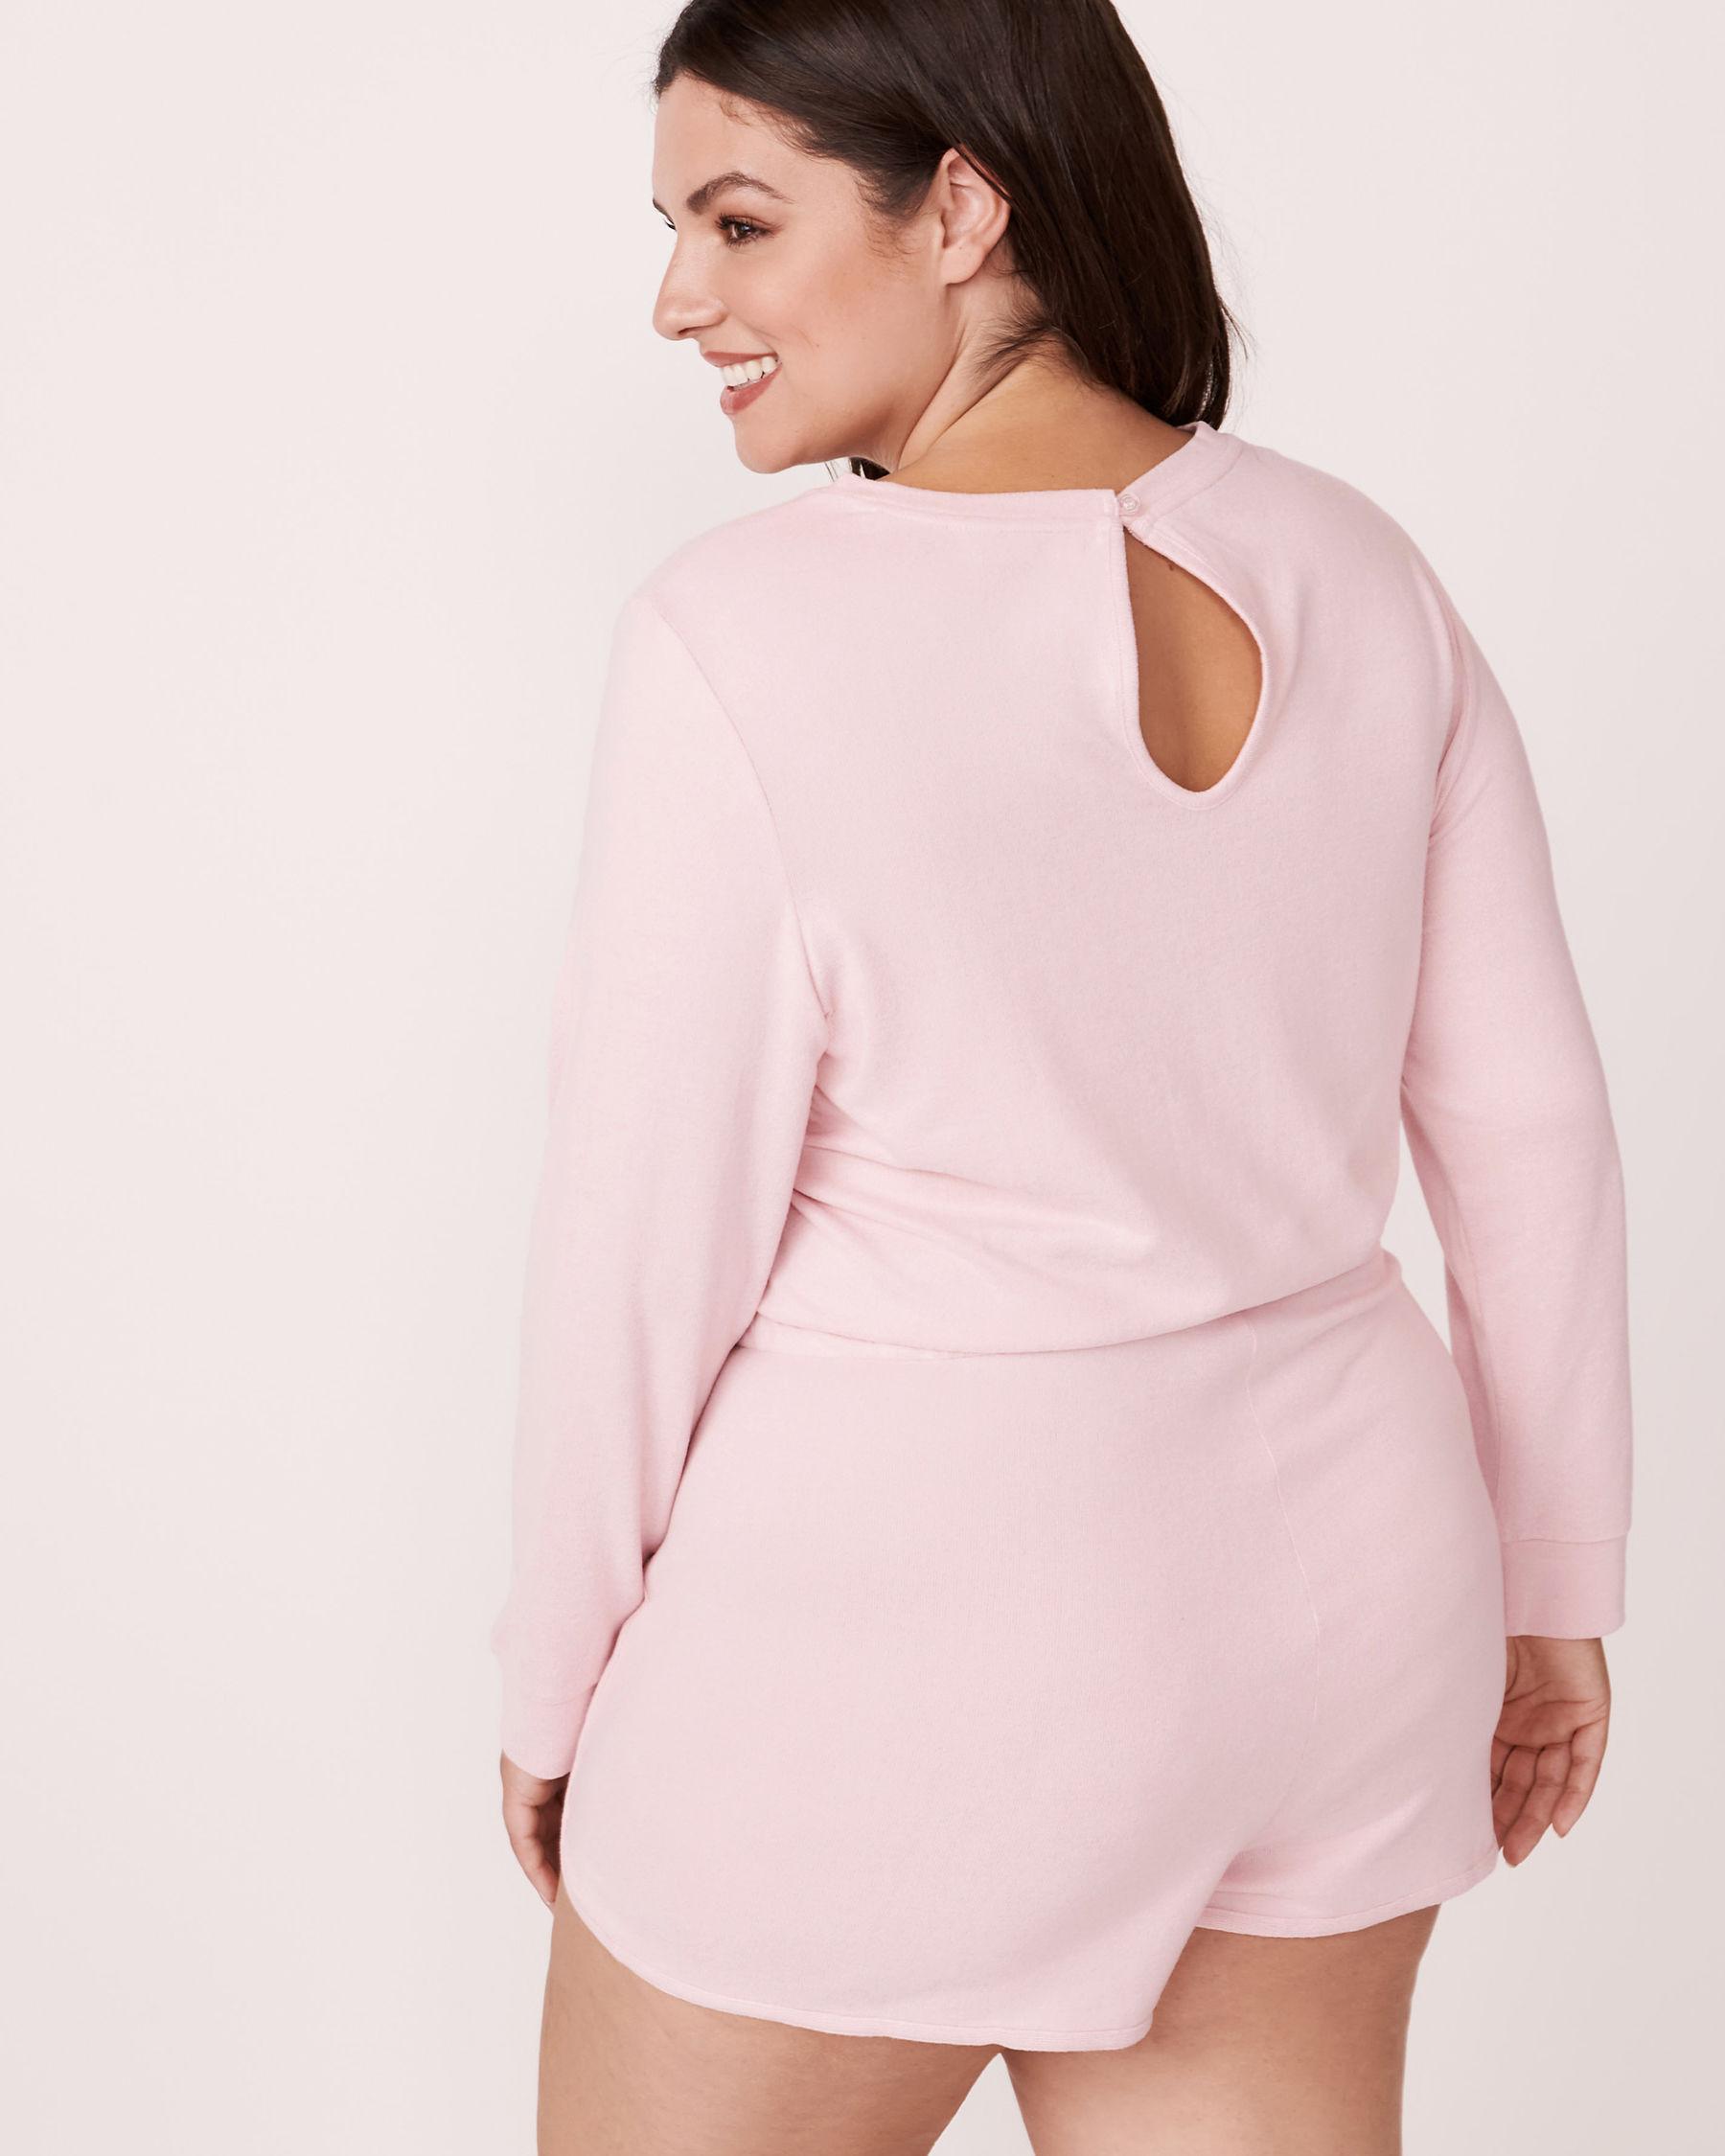 LA VIE EN ROSE Soft Knit Long Sleeves Romper Mix pink 775-312-0-11 - View5